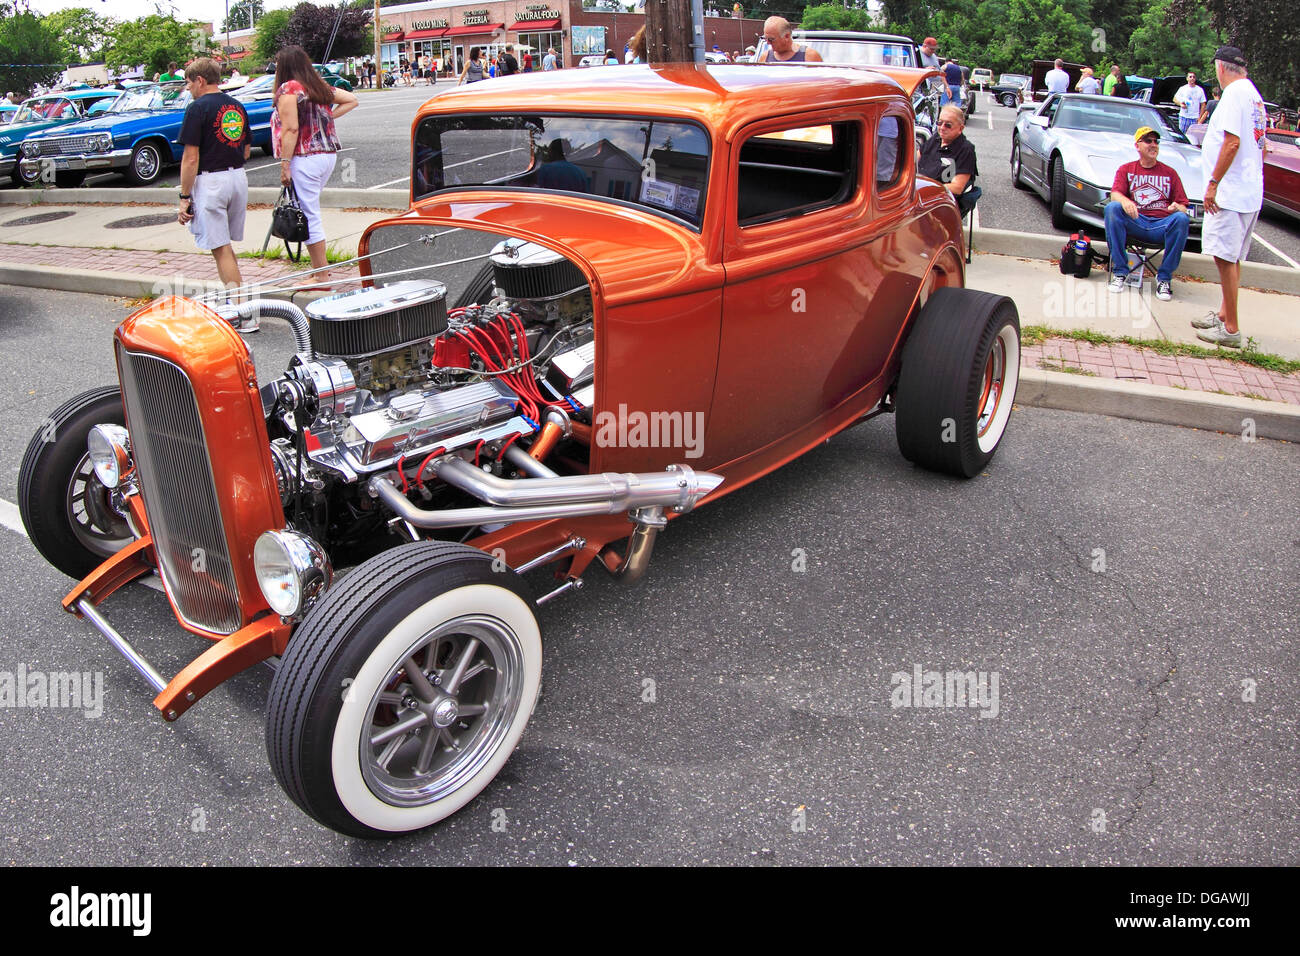 Long Island Car Shows >> Hot Rod On Display At Classic Car Show Sayville Long Island New York